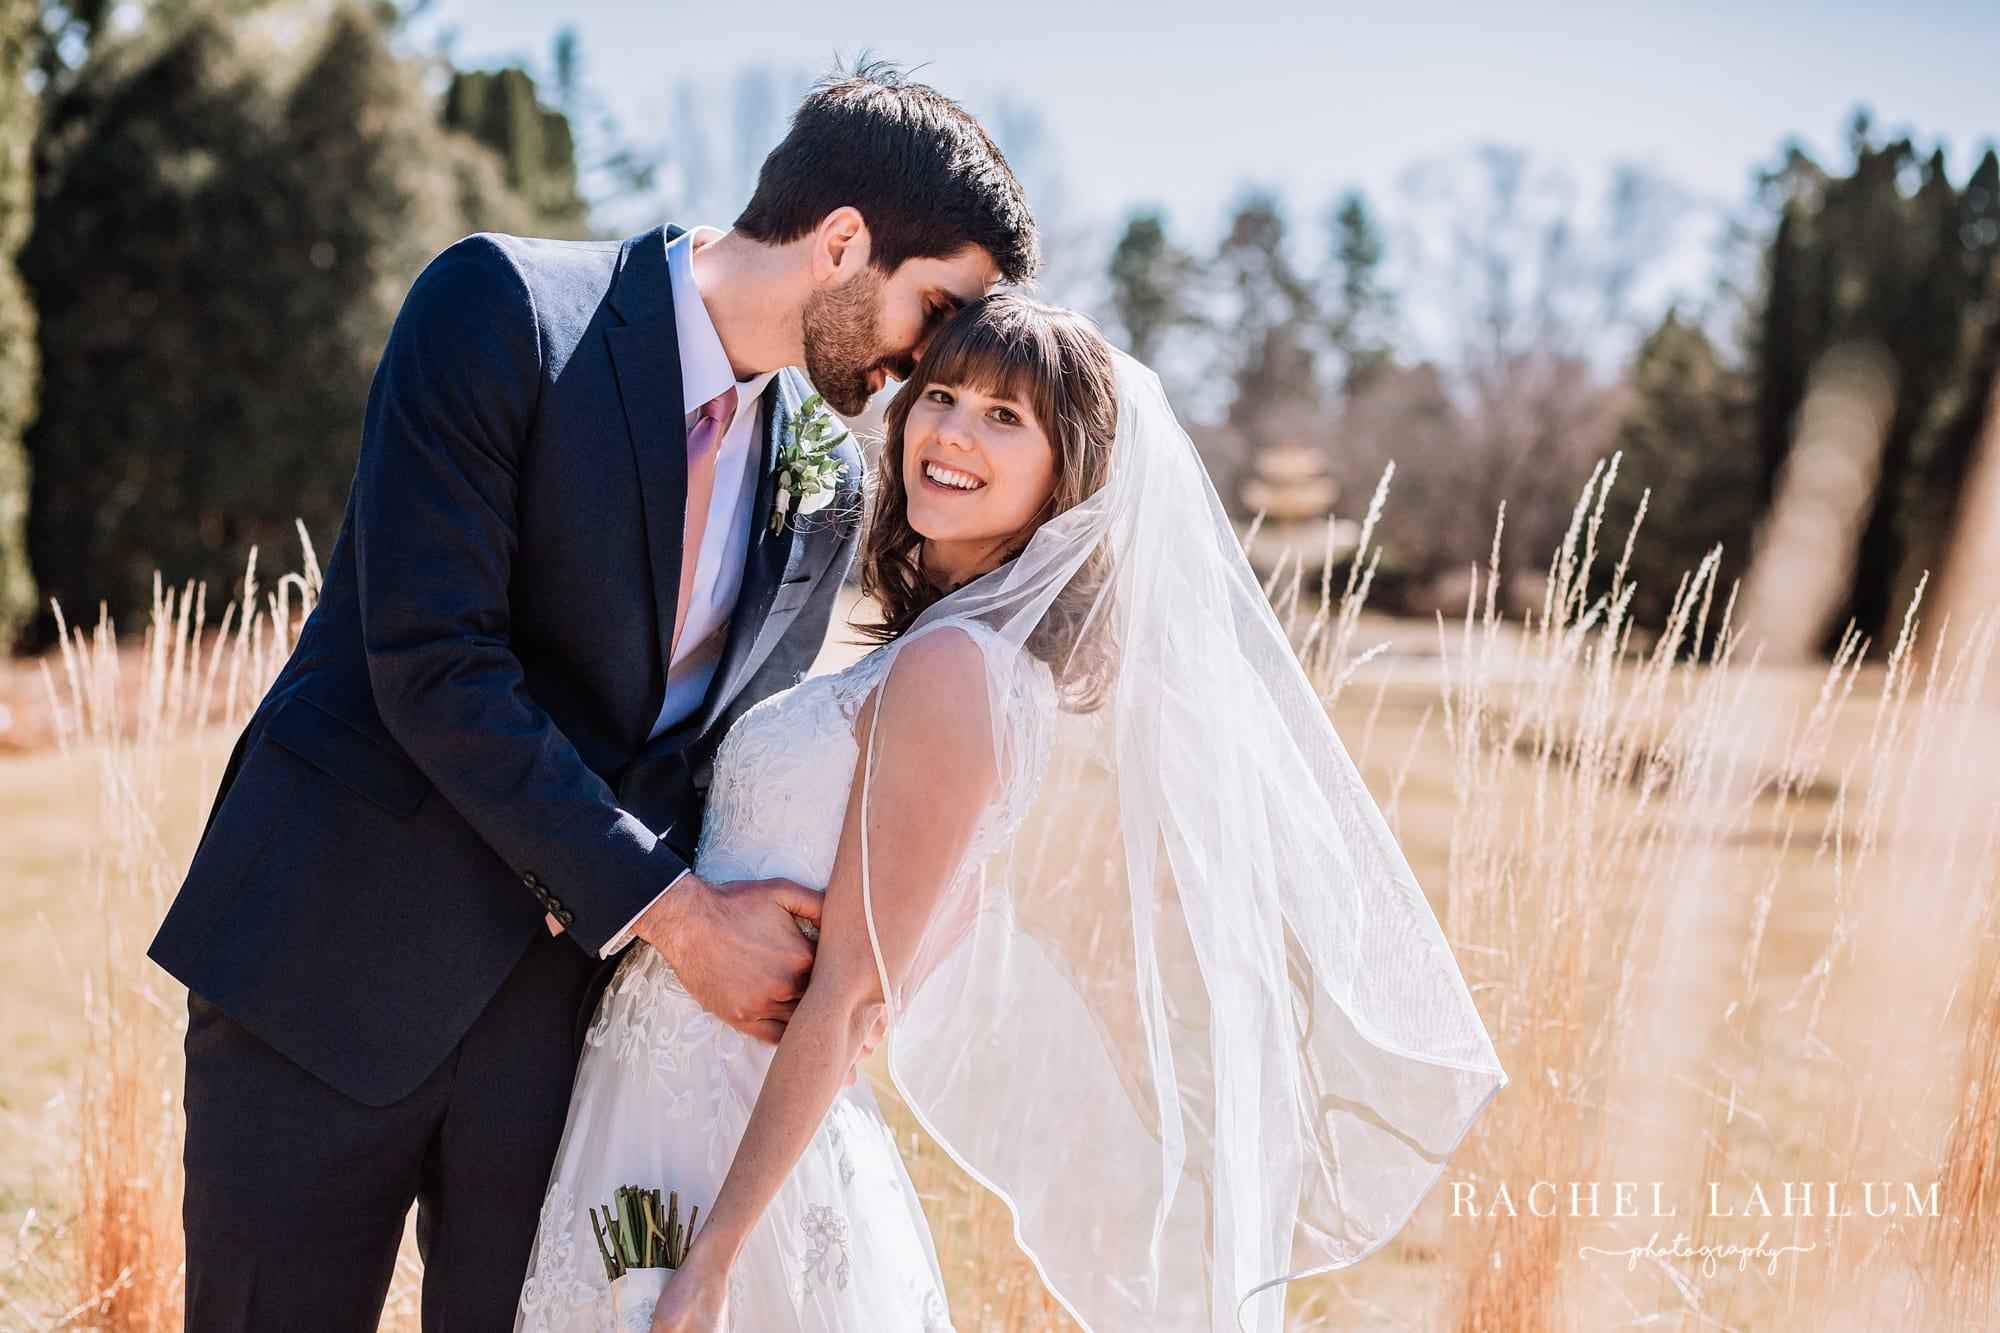 Groom dips bride in portrait at Mendakota Country Club.